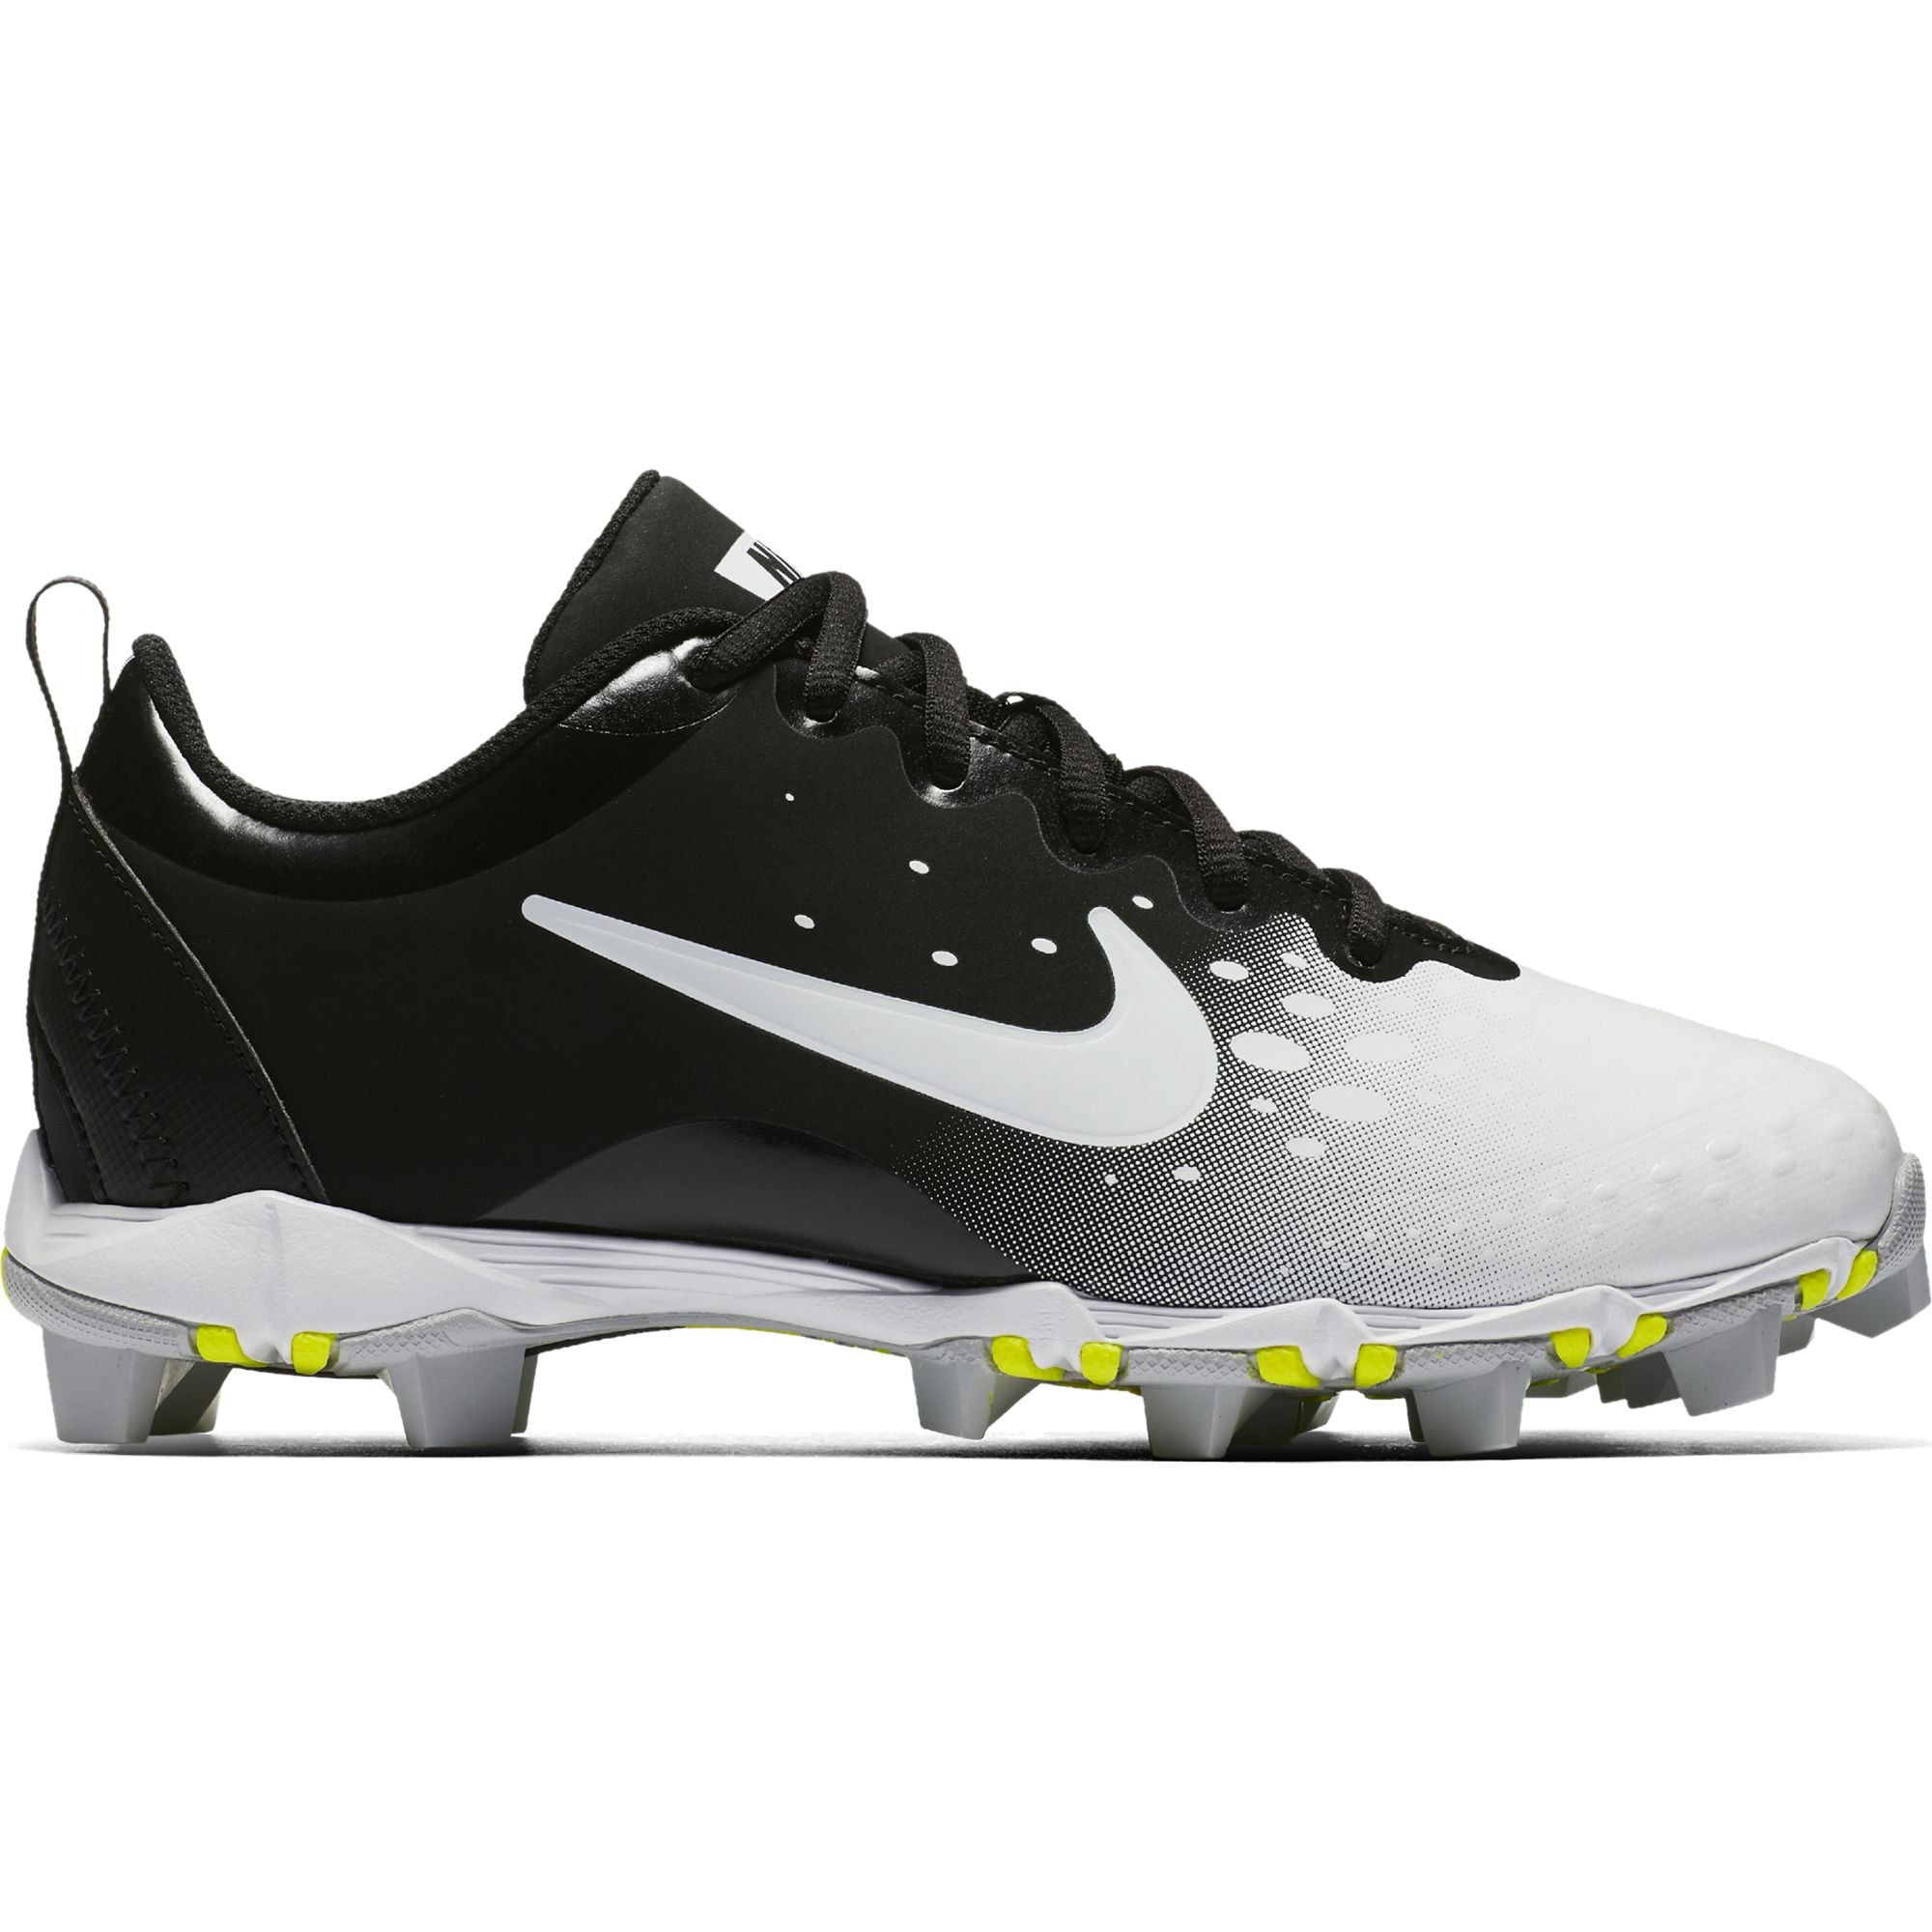 Nike Girl's Hyperdiamond 2 Keystone Softball Cleat Black/White/Wolf Grey Size 11 Kids US by Nike